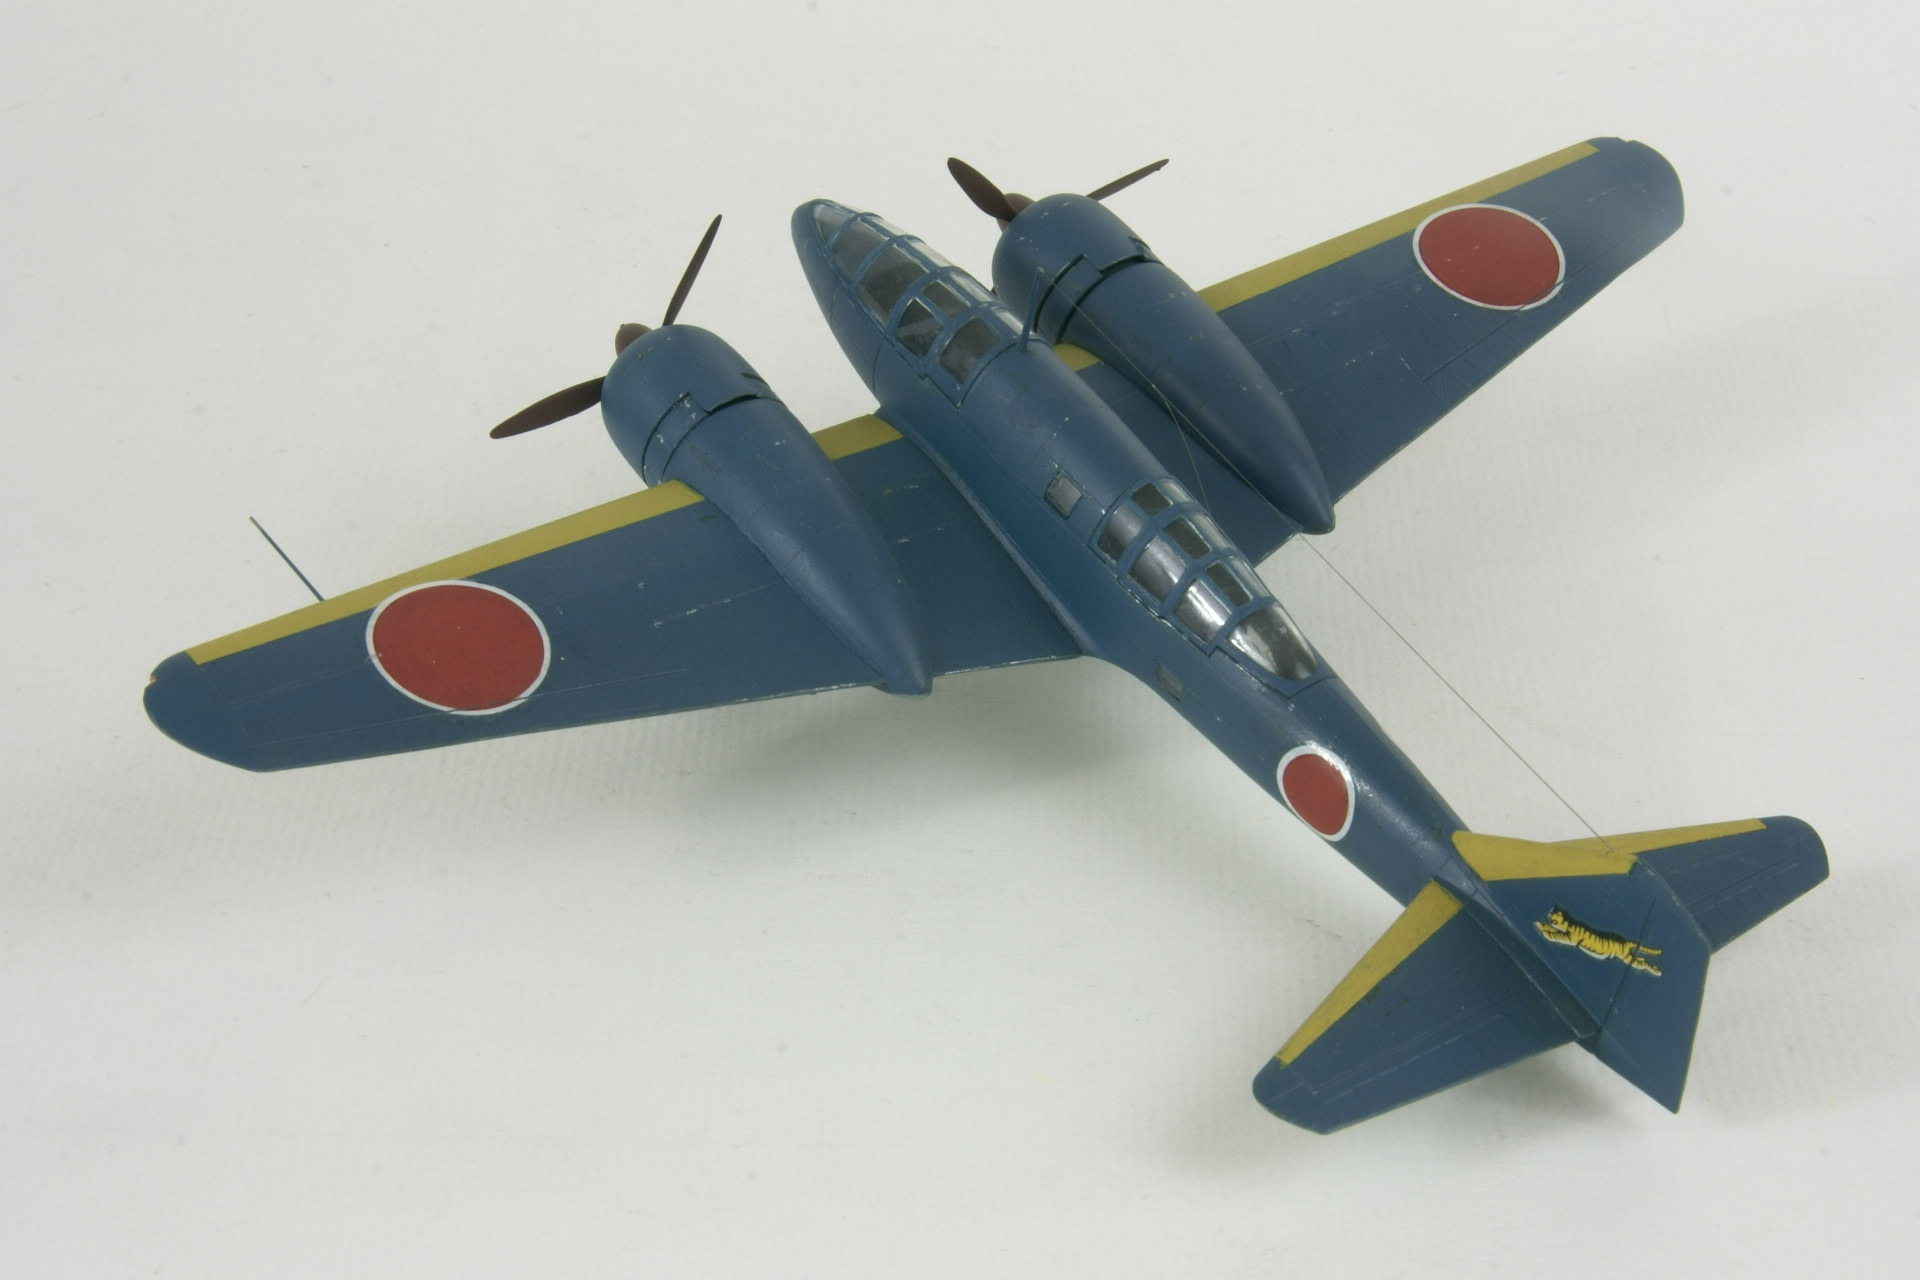 Mitsubishi ki 46 iii dinah 2 1